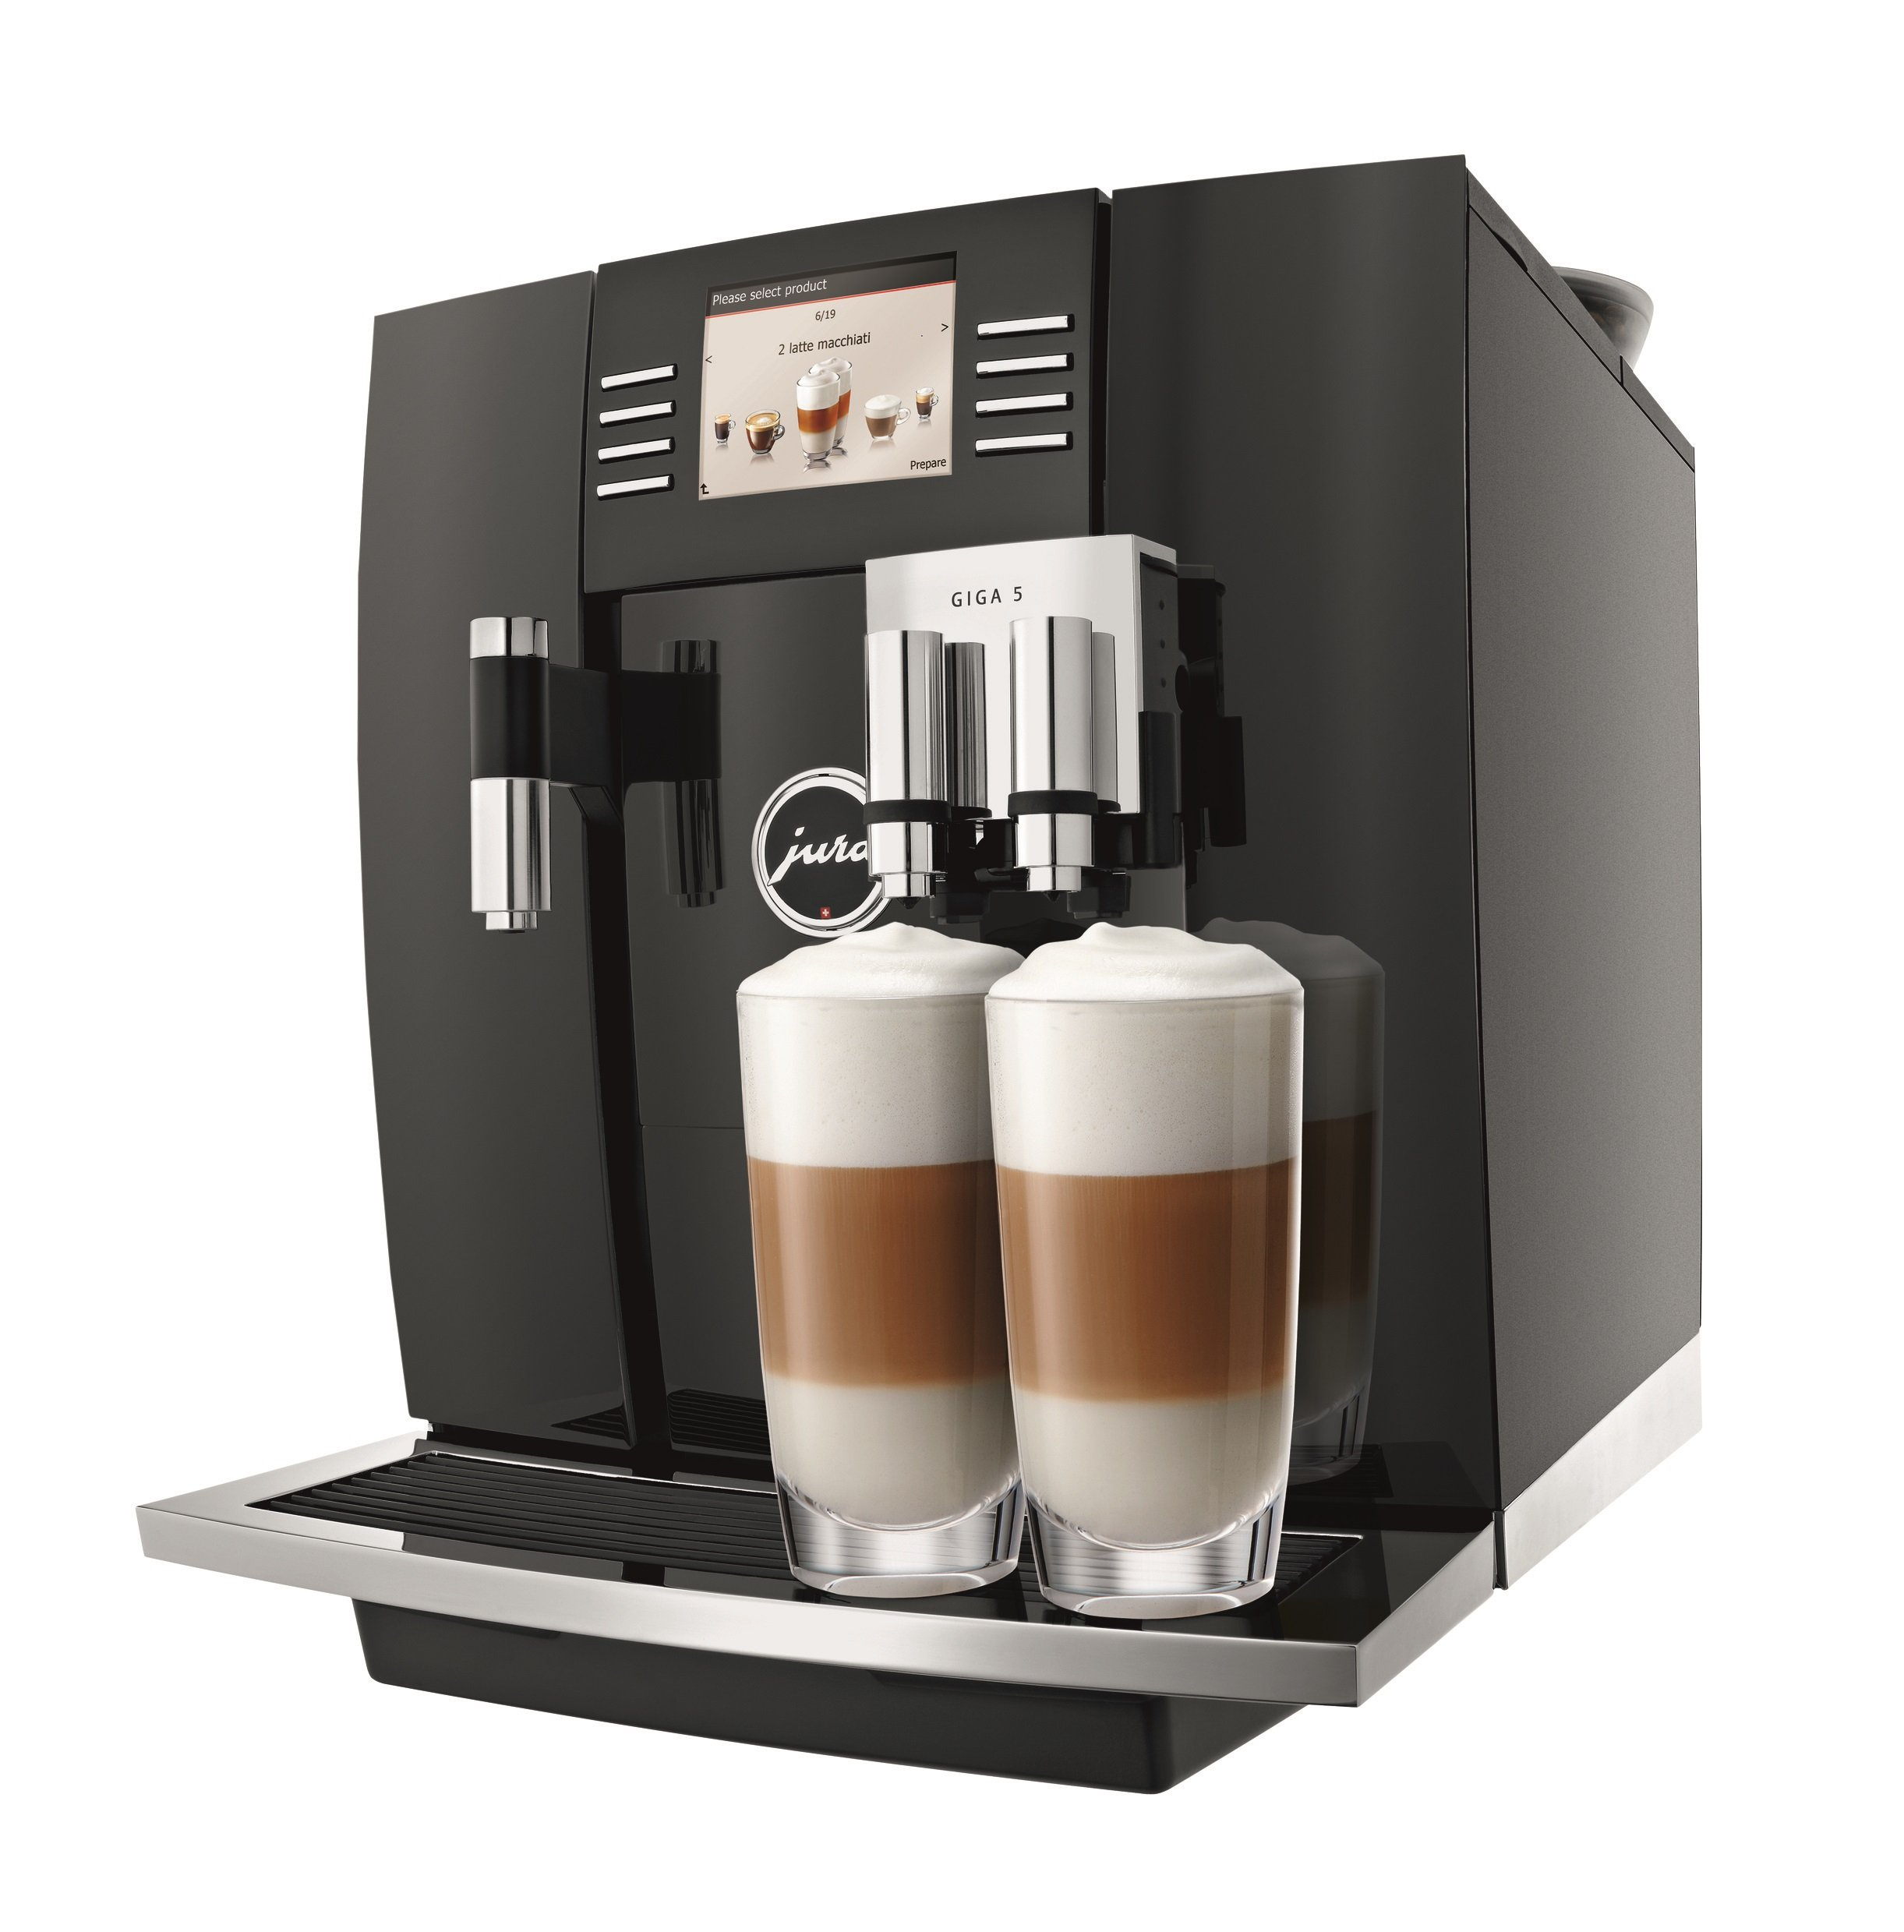 Jura 15066 Automatic Coffee Machine Giga 5, Piano Black by Jura (Image #1)